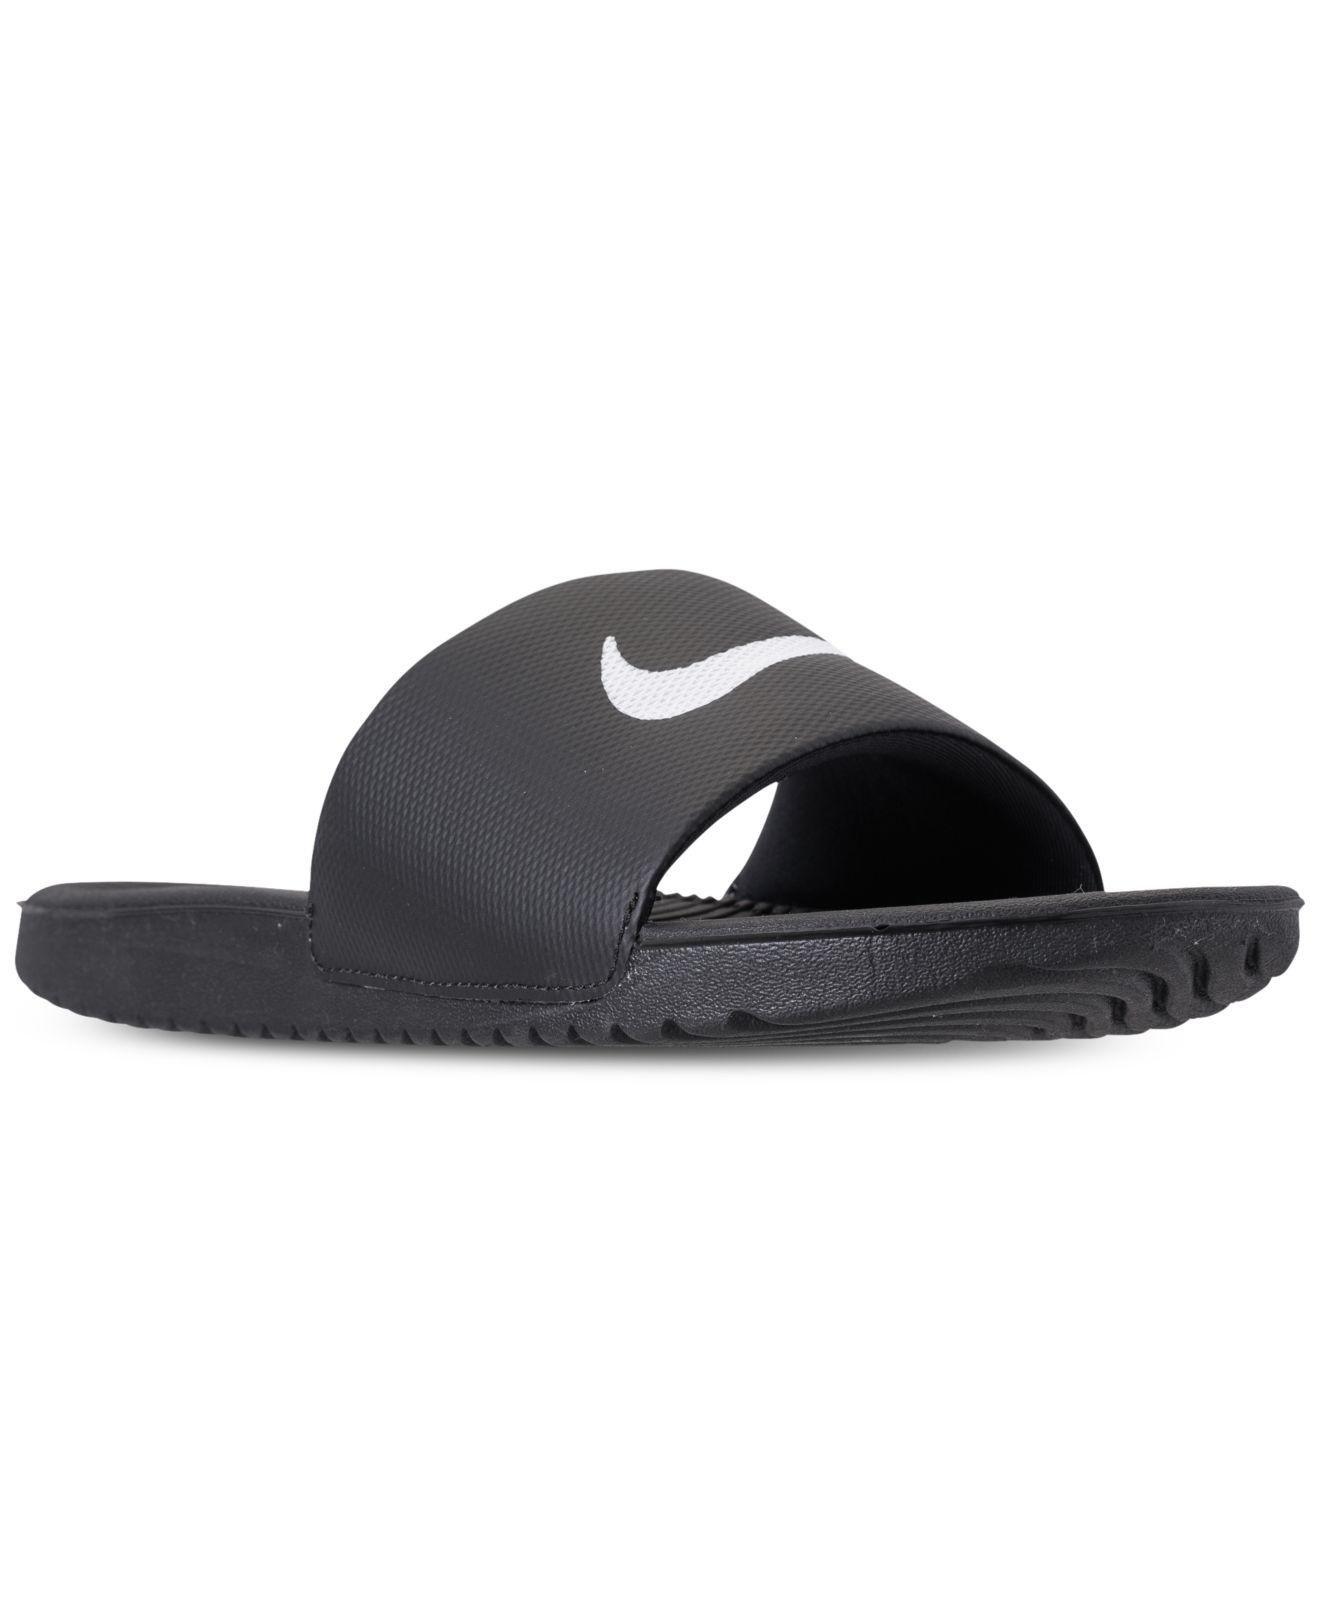 fccf96f56 Lyst - Nike Kawa Slide Sandals From Finish Line in Black for Men